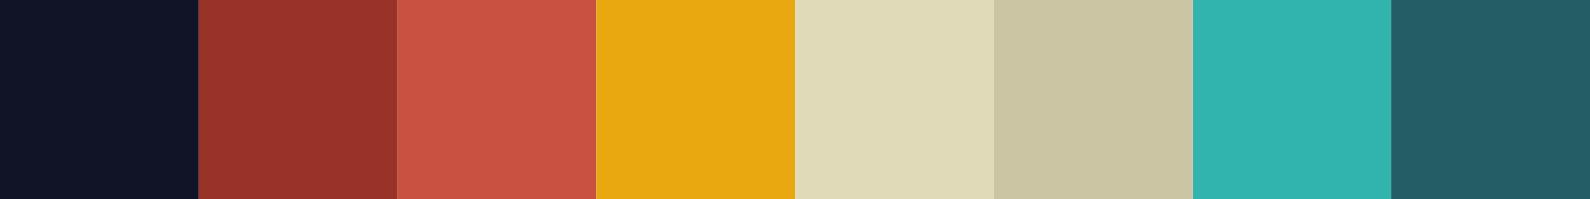 phoenix_palette